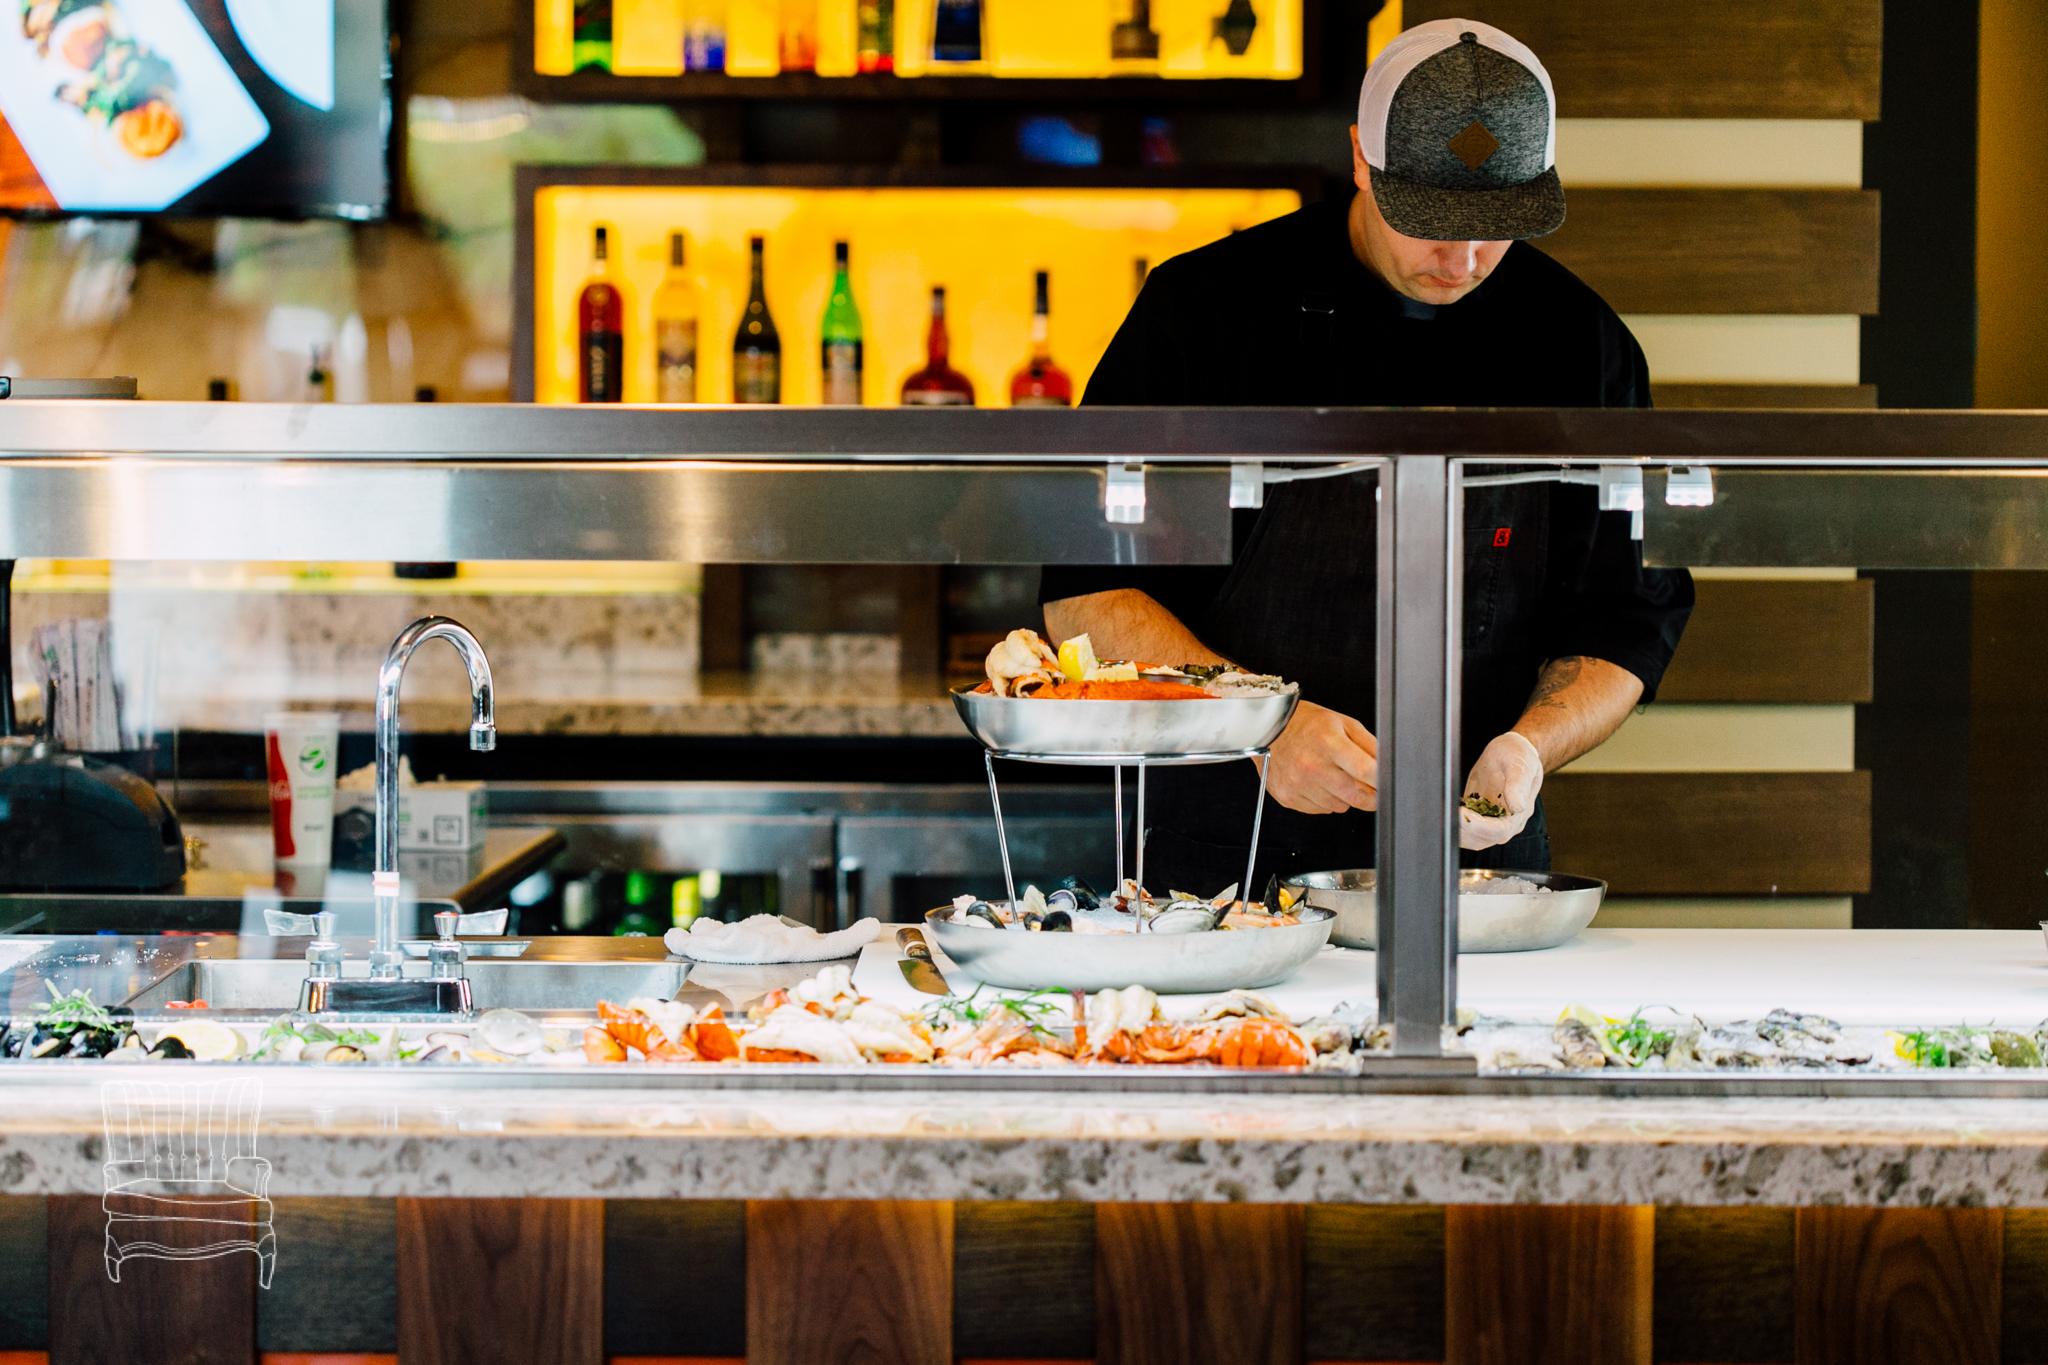 bellingham-sheraton-btown-raw-bar-seafood-katheryn-moran-food-10.jpg